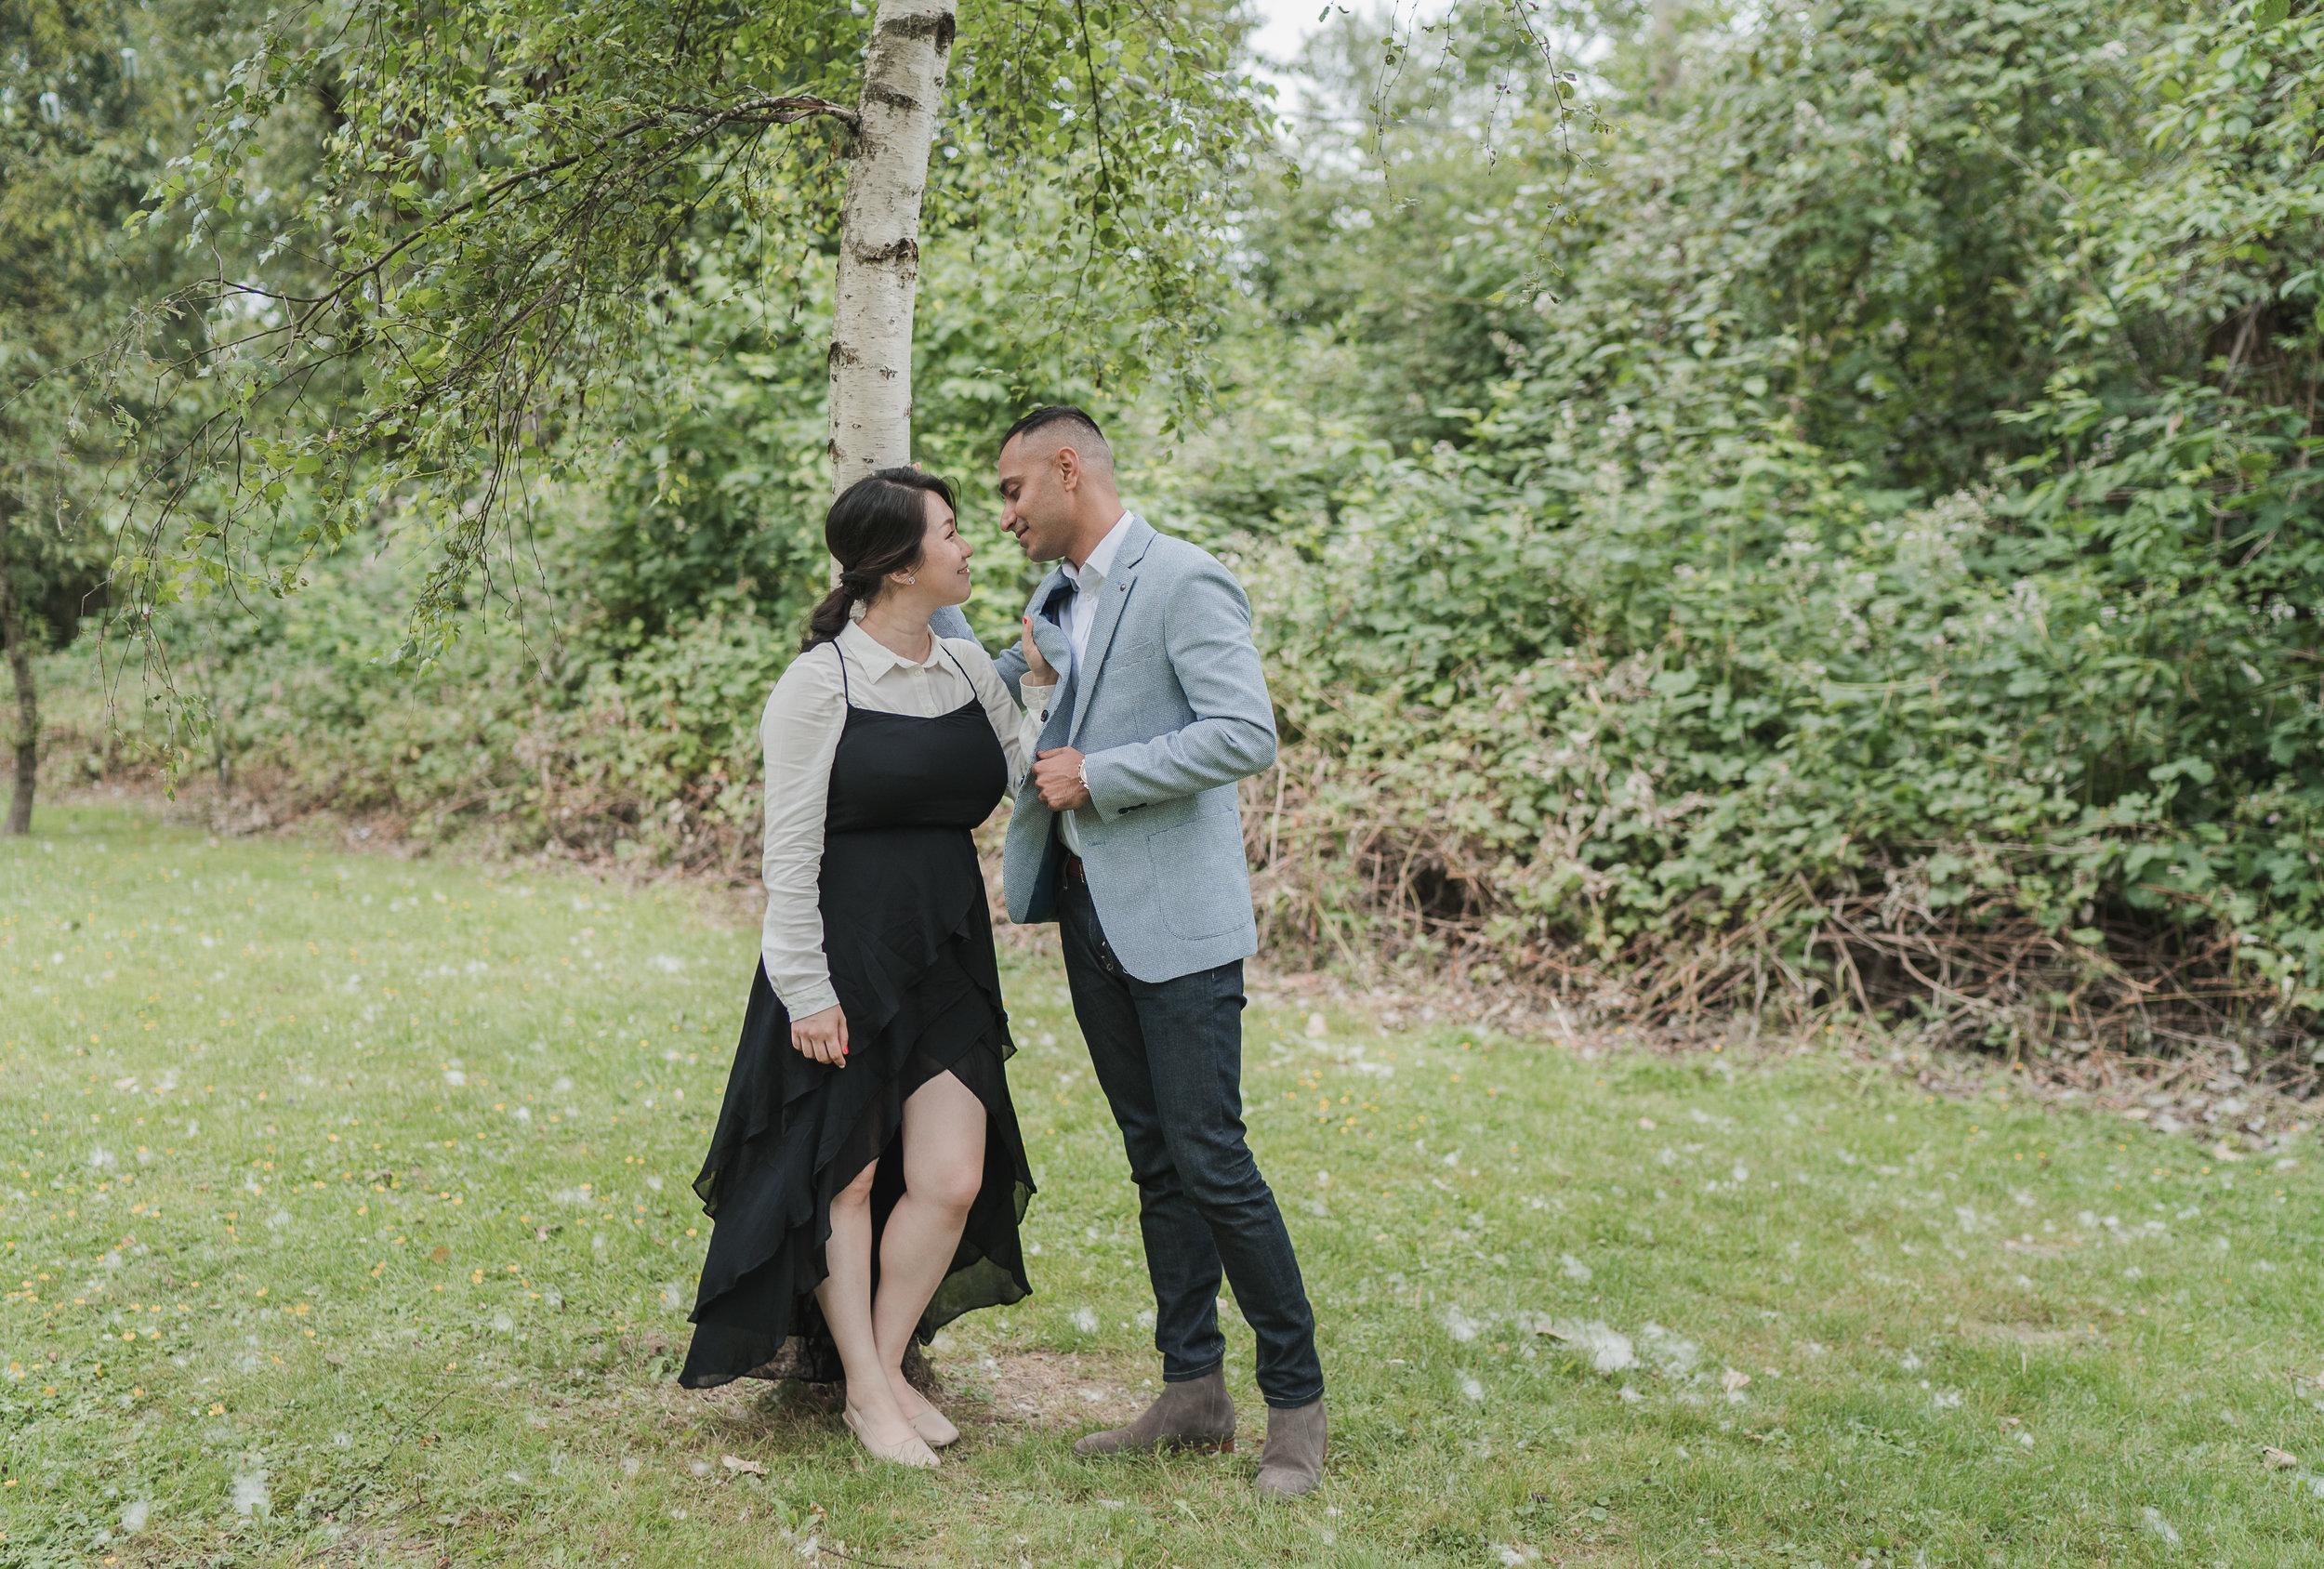 20190622 - Monika & Johnson Engagement- 0052.jpg